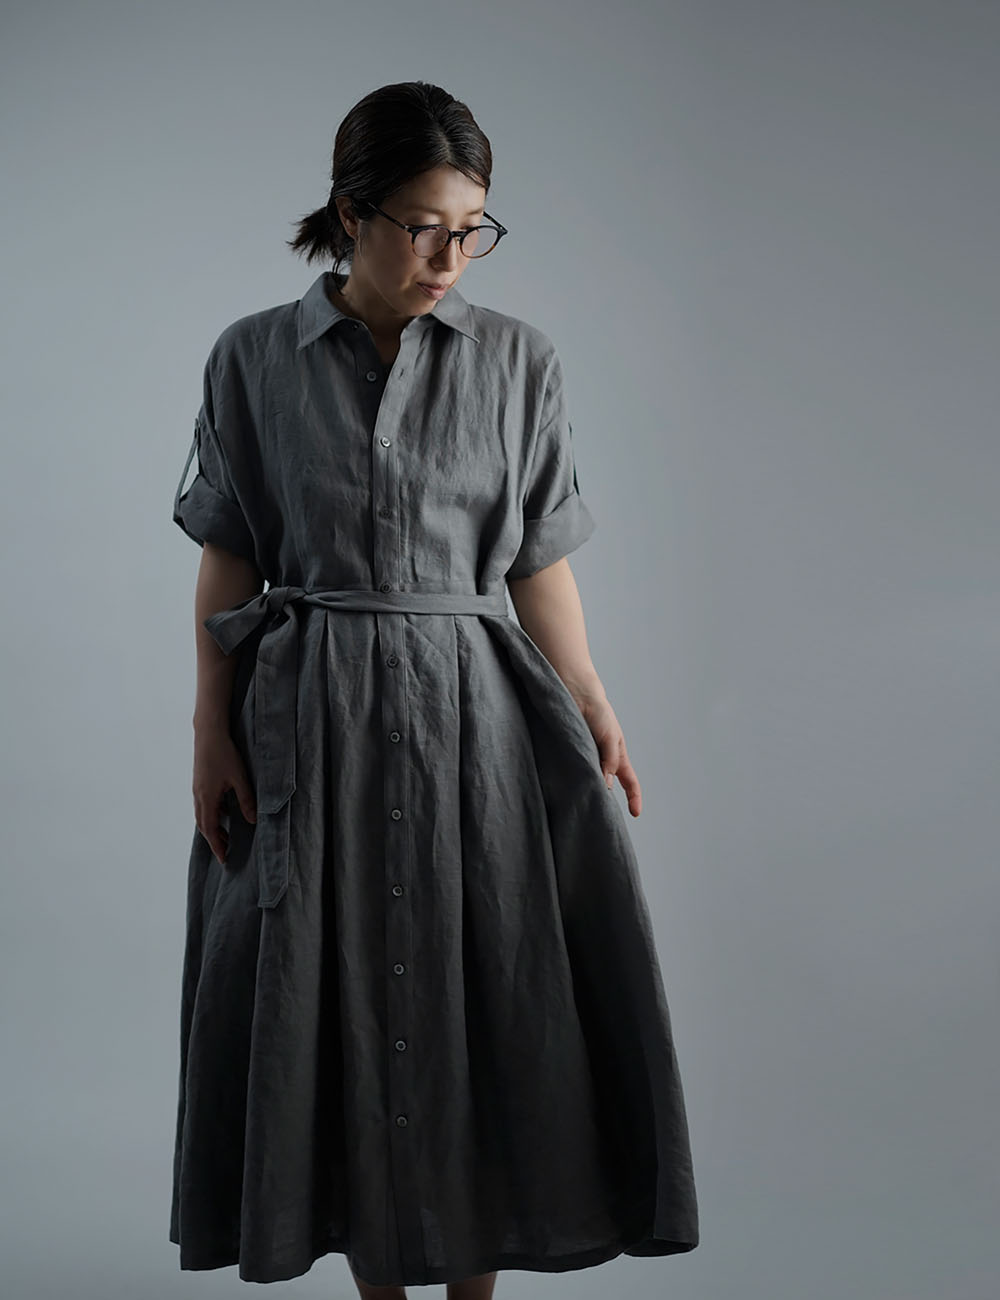 【wafu】Linen Dress   2wey ワンピース  アウターにも / 鈍色(にびいろ) a064a-nib1